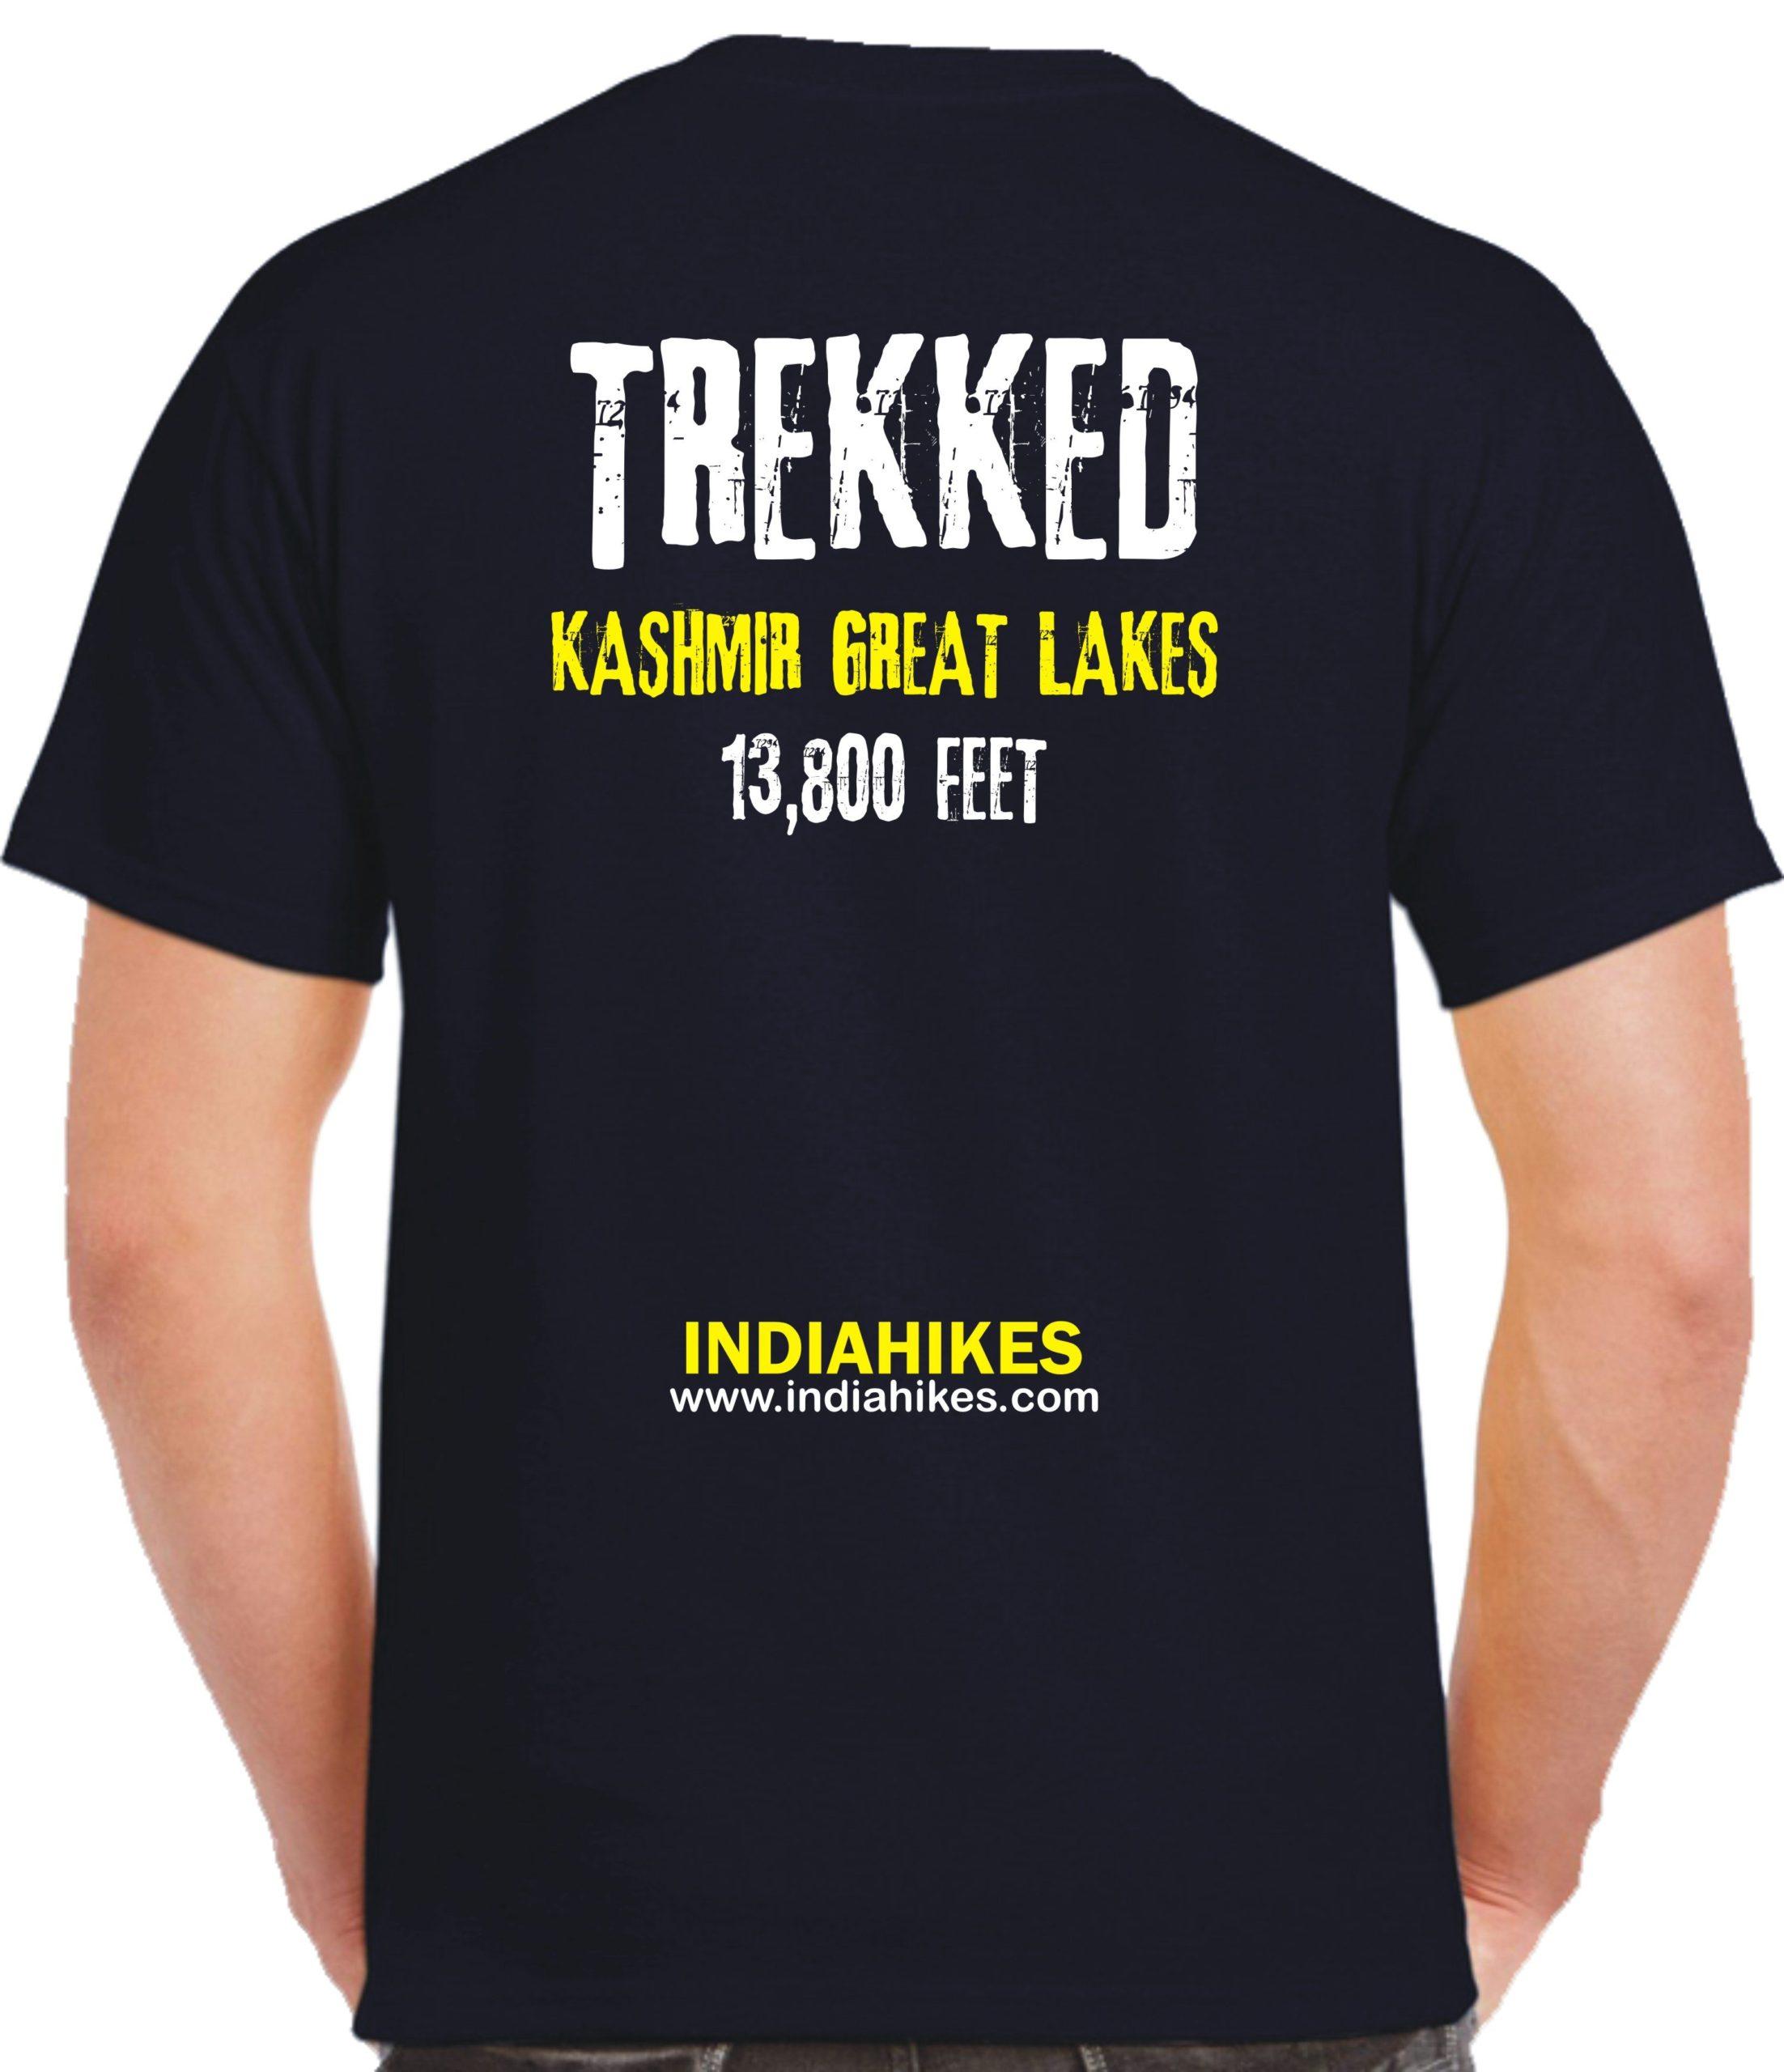 Kashmir Great Lakes